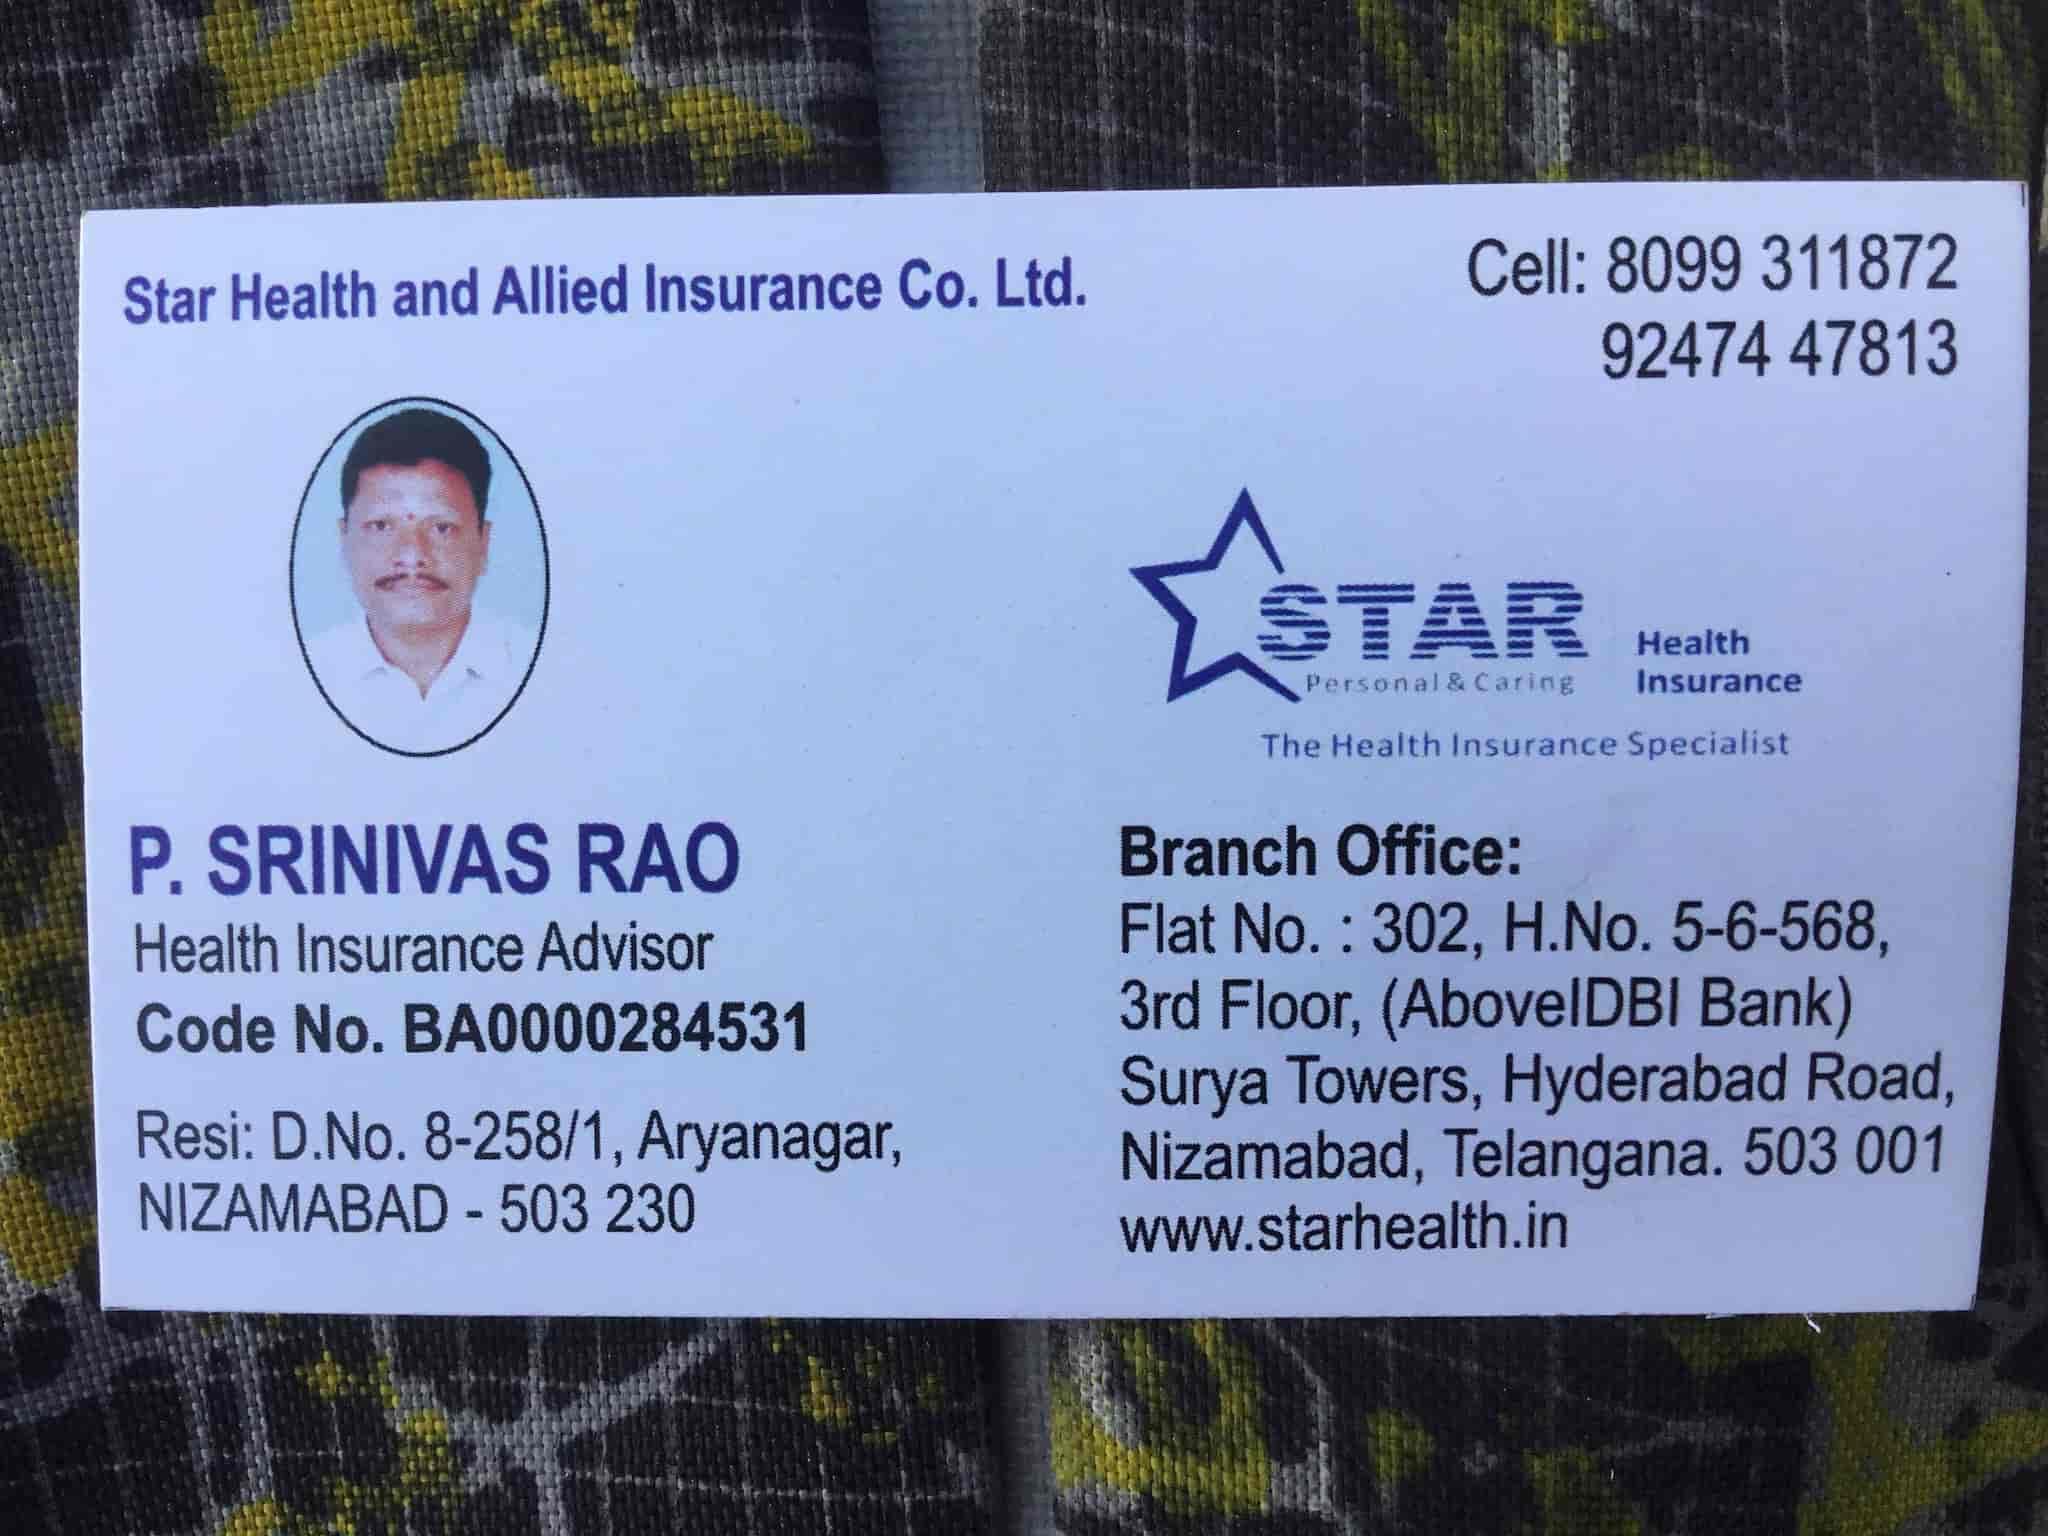 Star Health Allied Insurance Company Ltd Shivaji Nagar Insurance Companies In Nizamabad Nizamabad Justdial